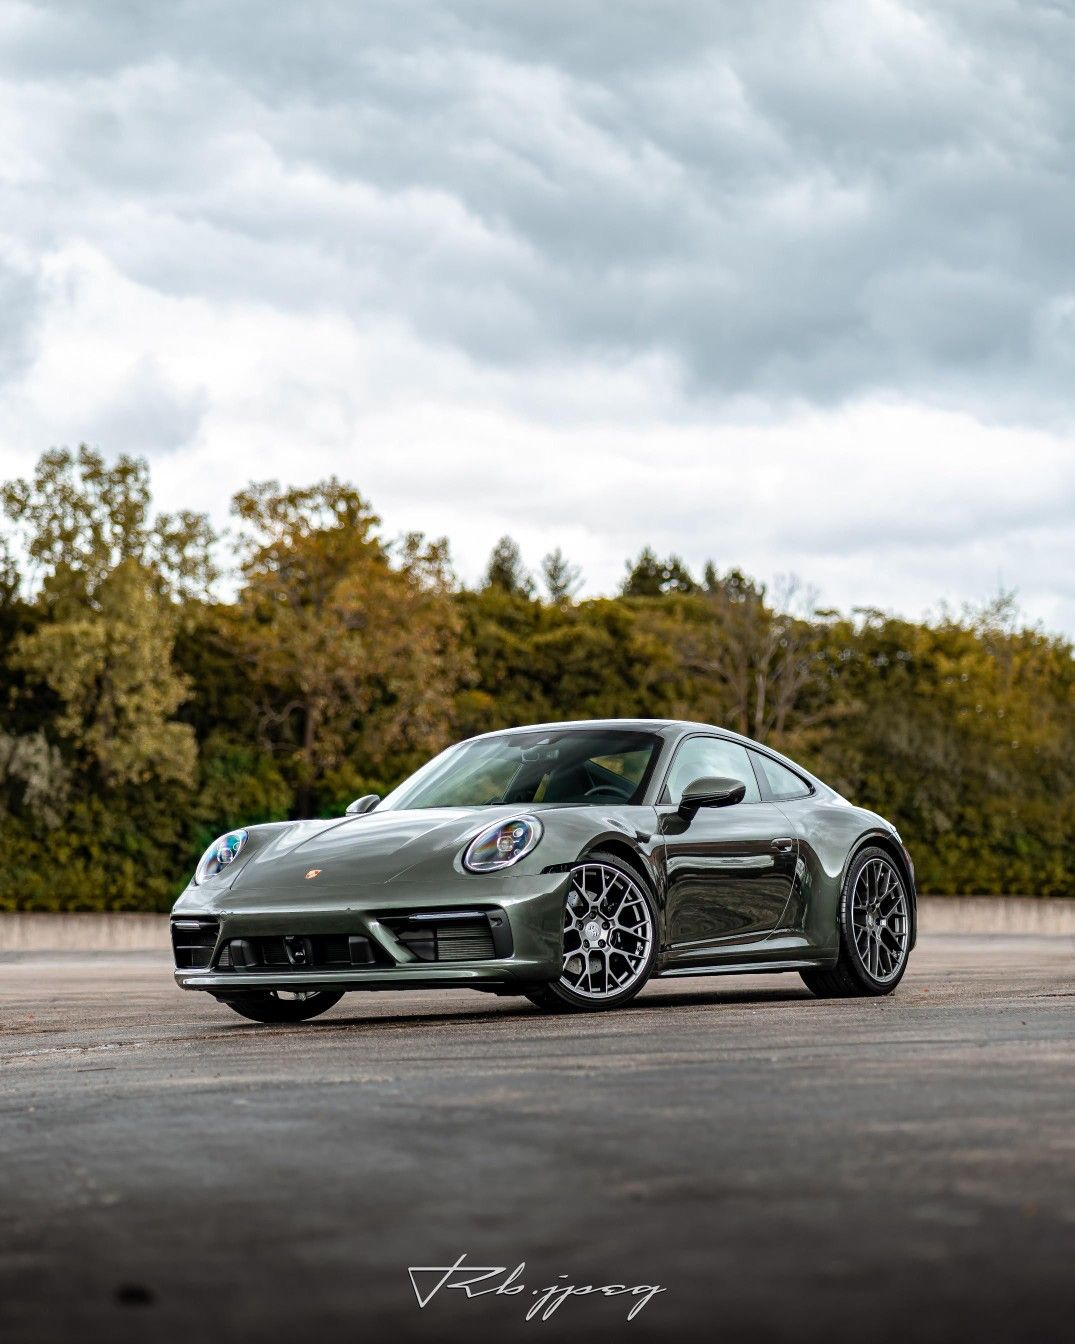 Beautiful Aventurine Green Metallic 992 Carrera S Porsche Cars Porsche Mercedes Wallpaper